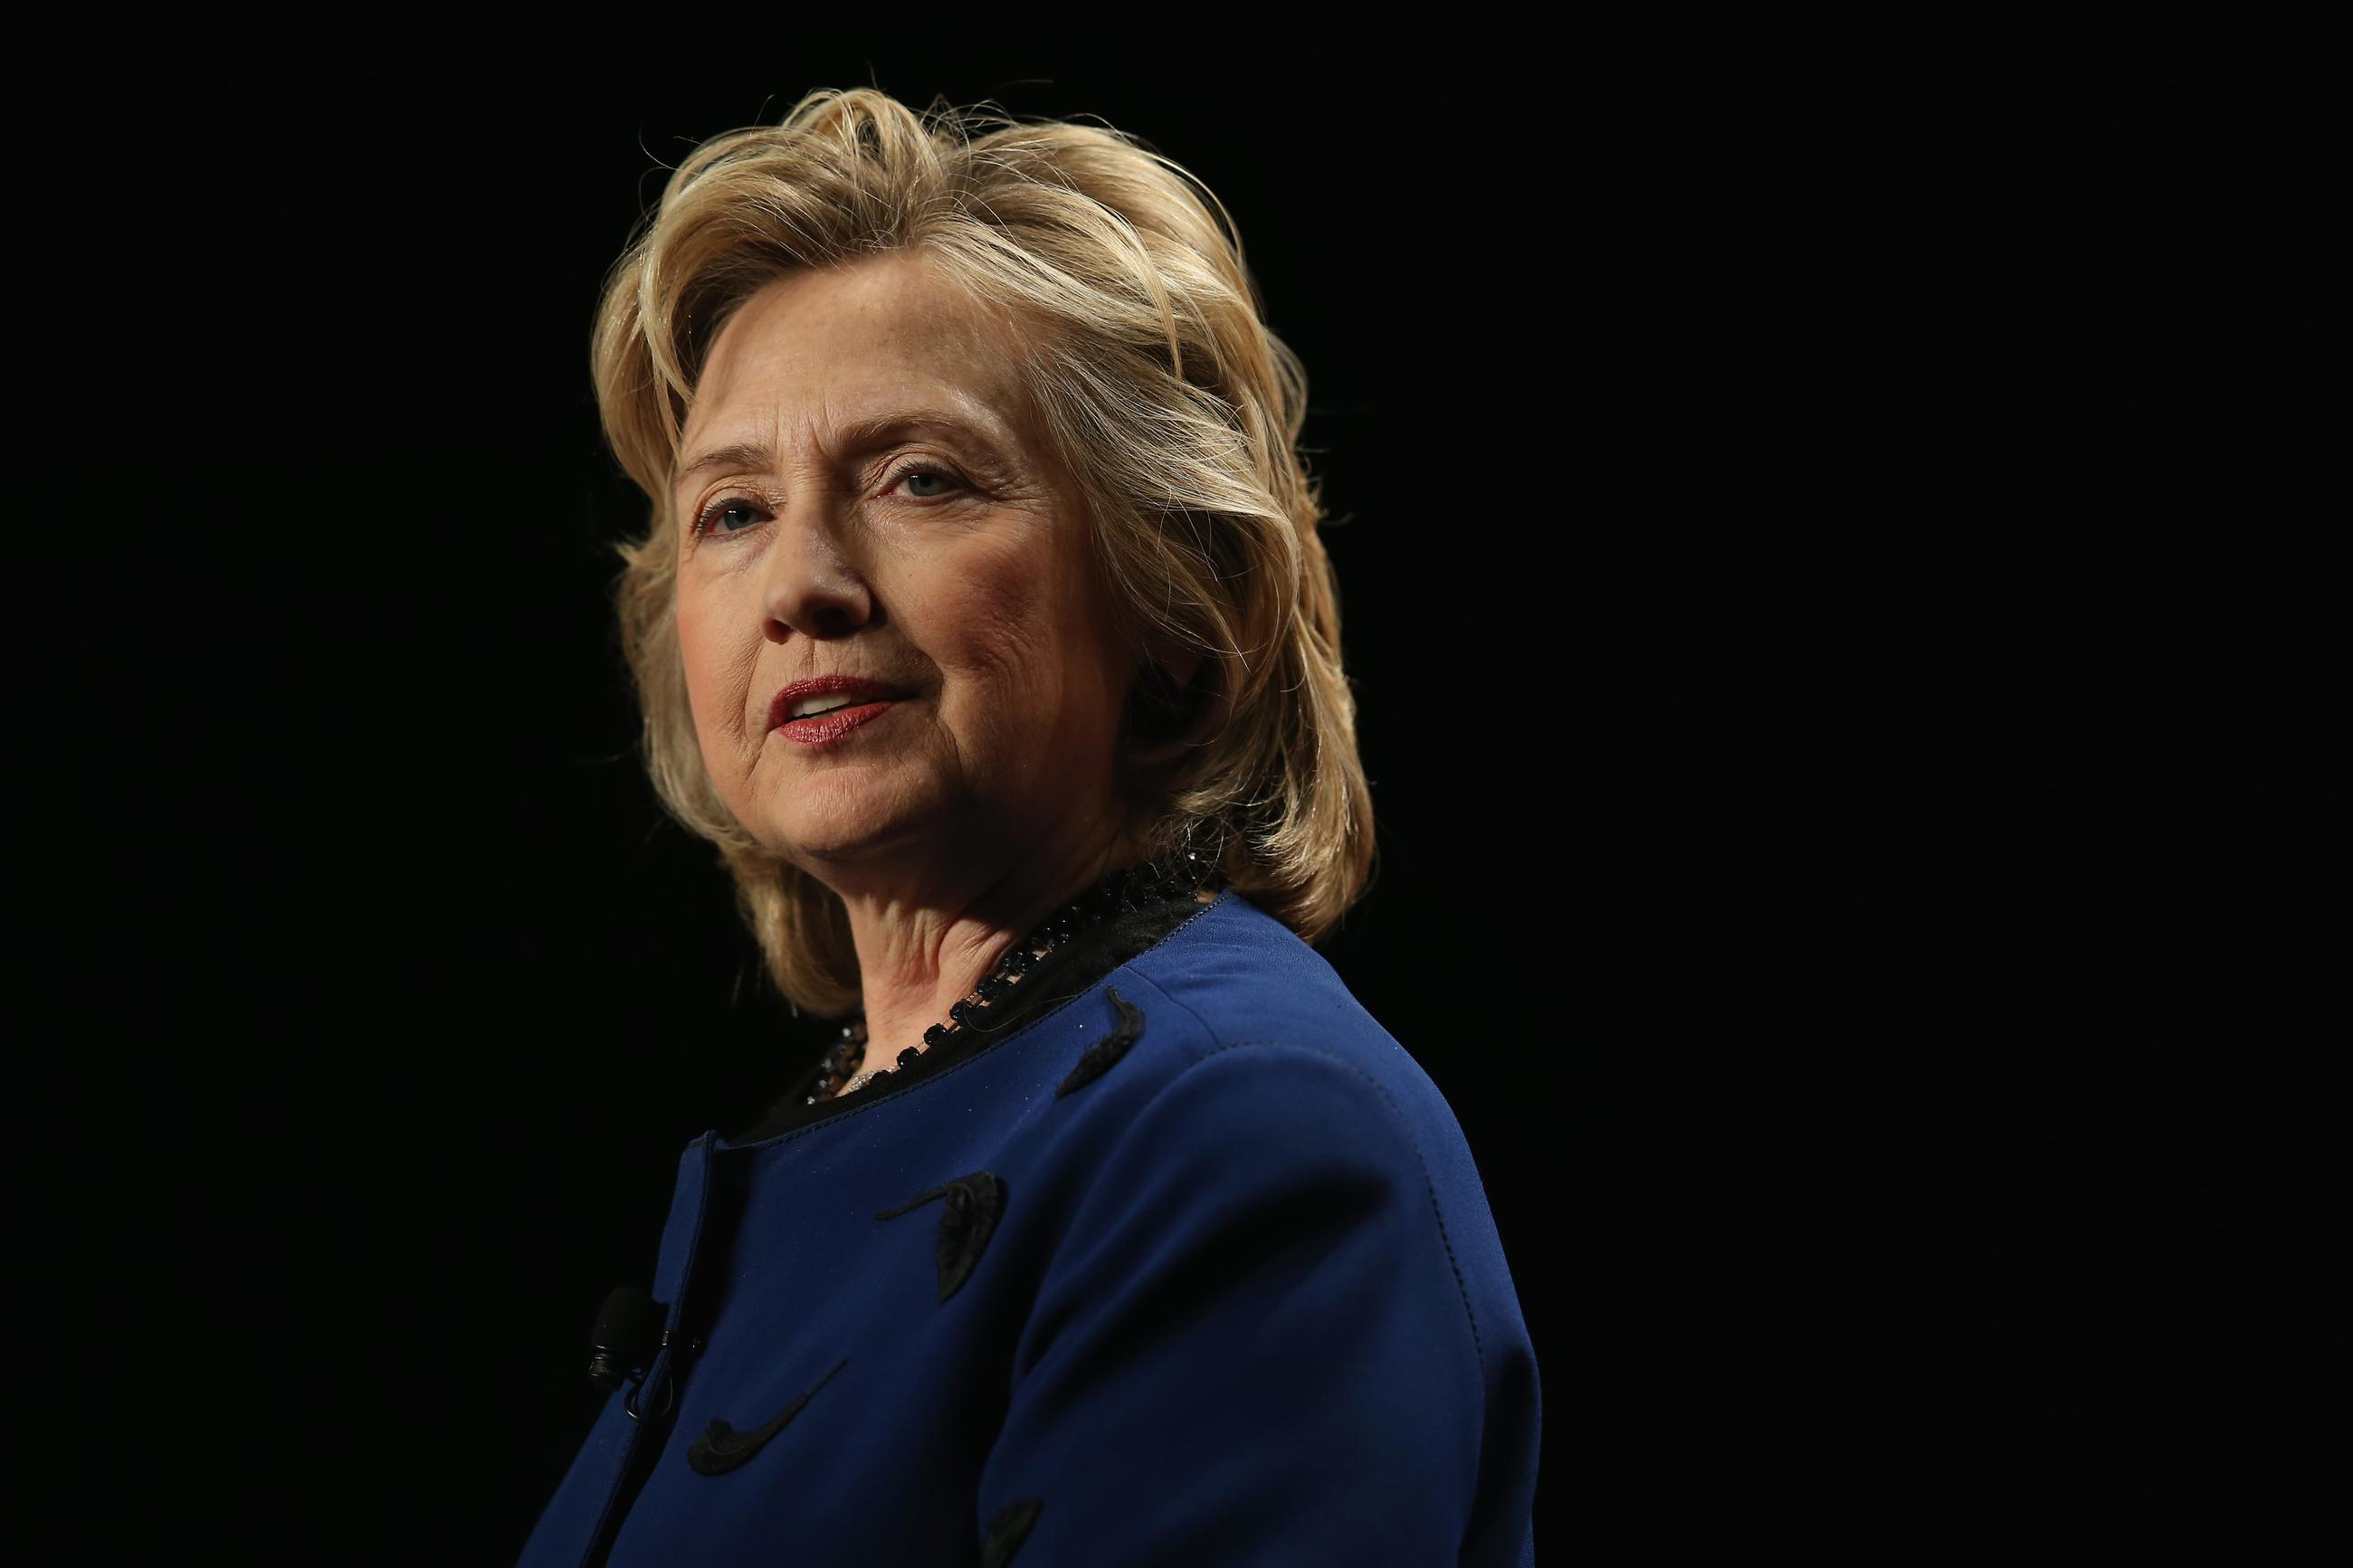 Anti-Hillary Group Brings in Half a Million Dollars